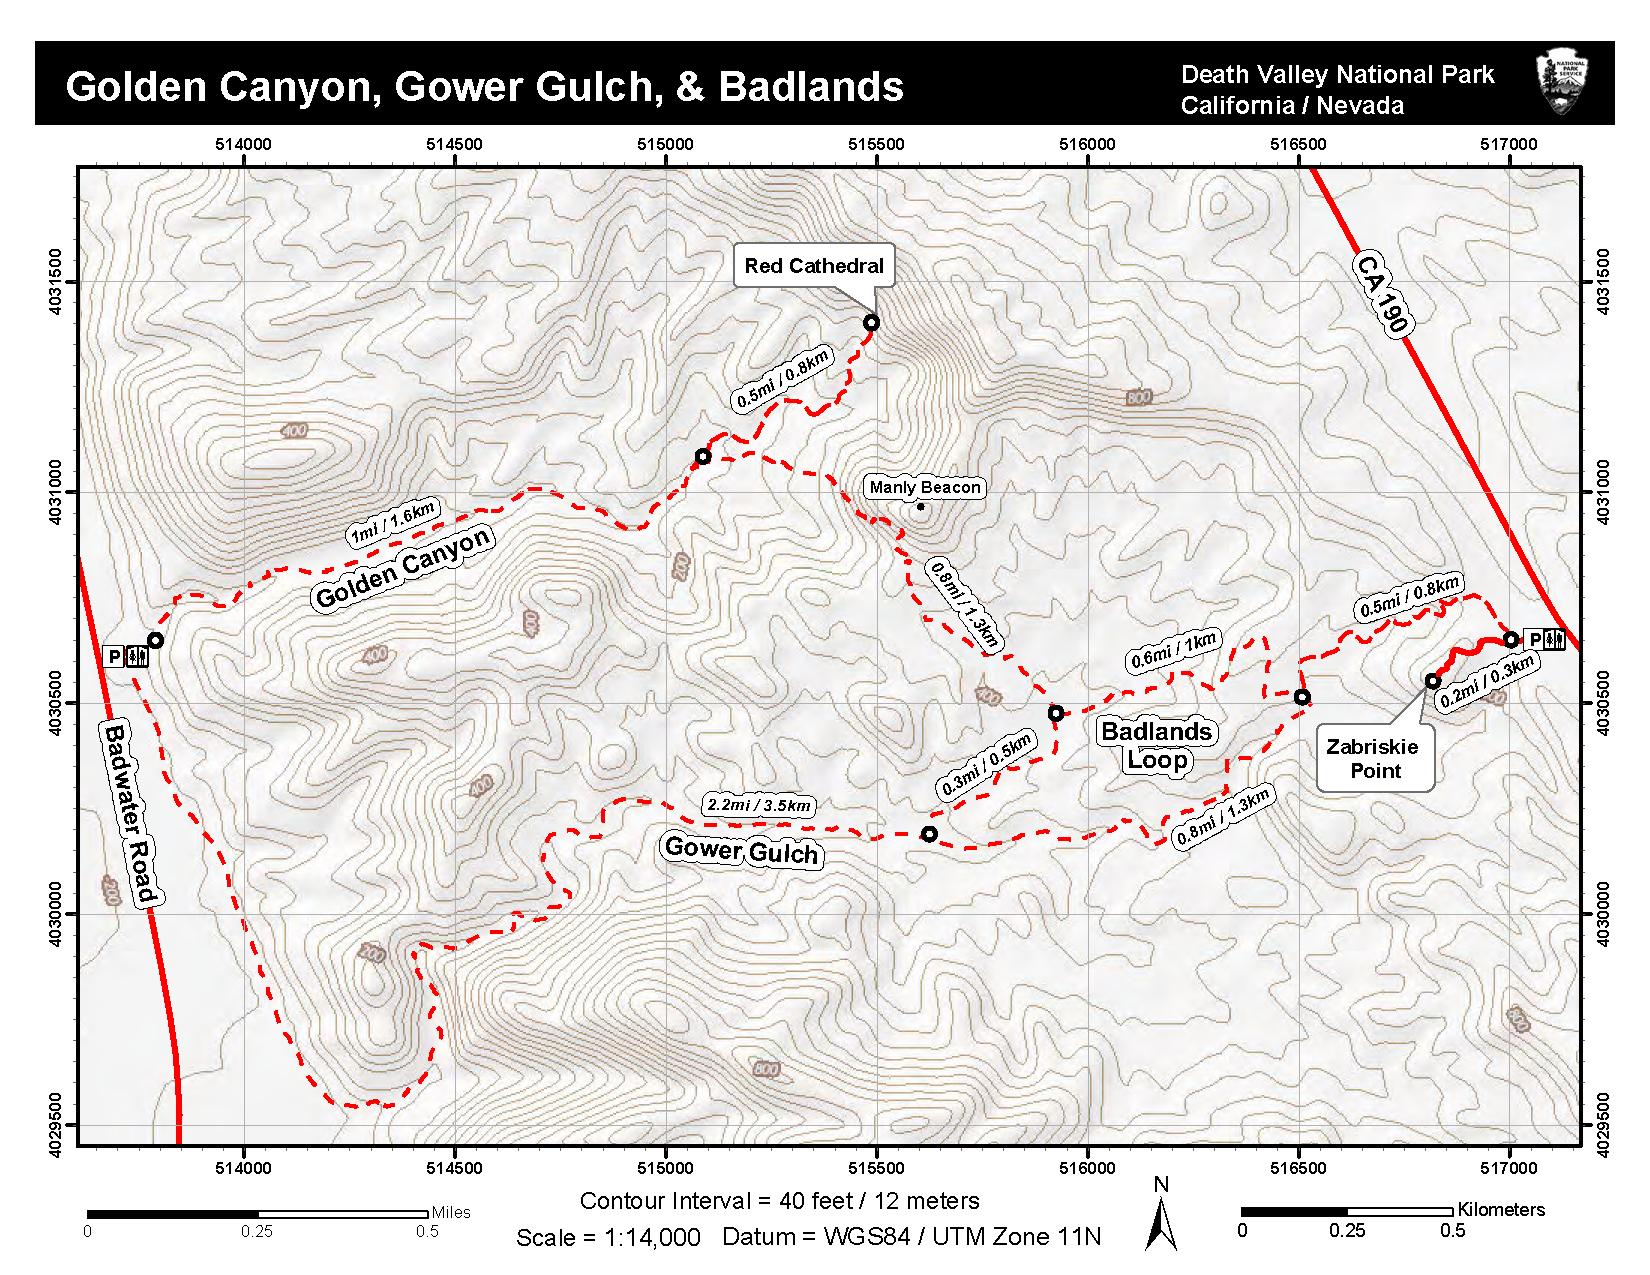 Golden Canyon Gower Gulch Badlands Death Valley National Park